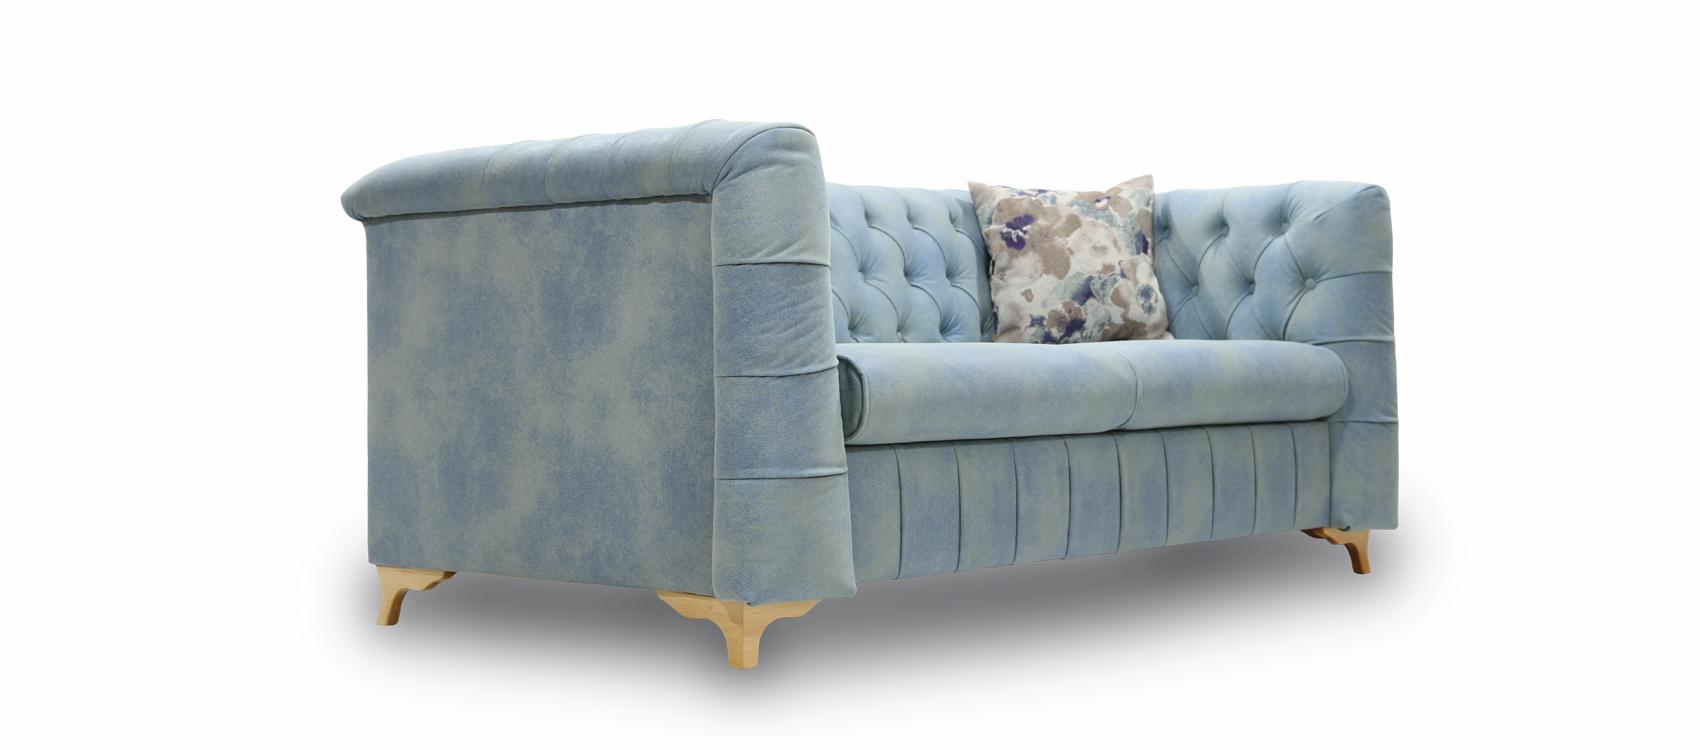 Sofa FLAIR 2 SEATER фото 2